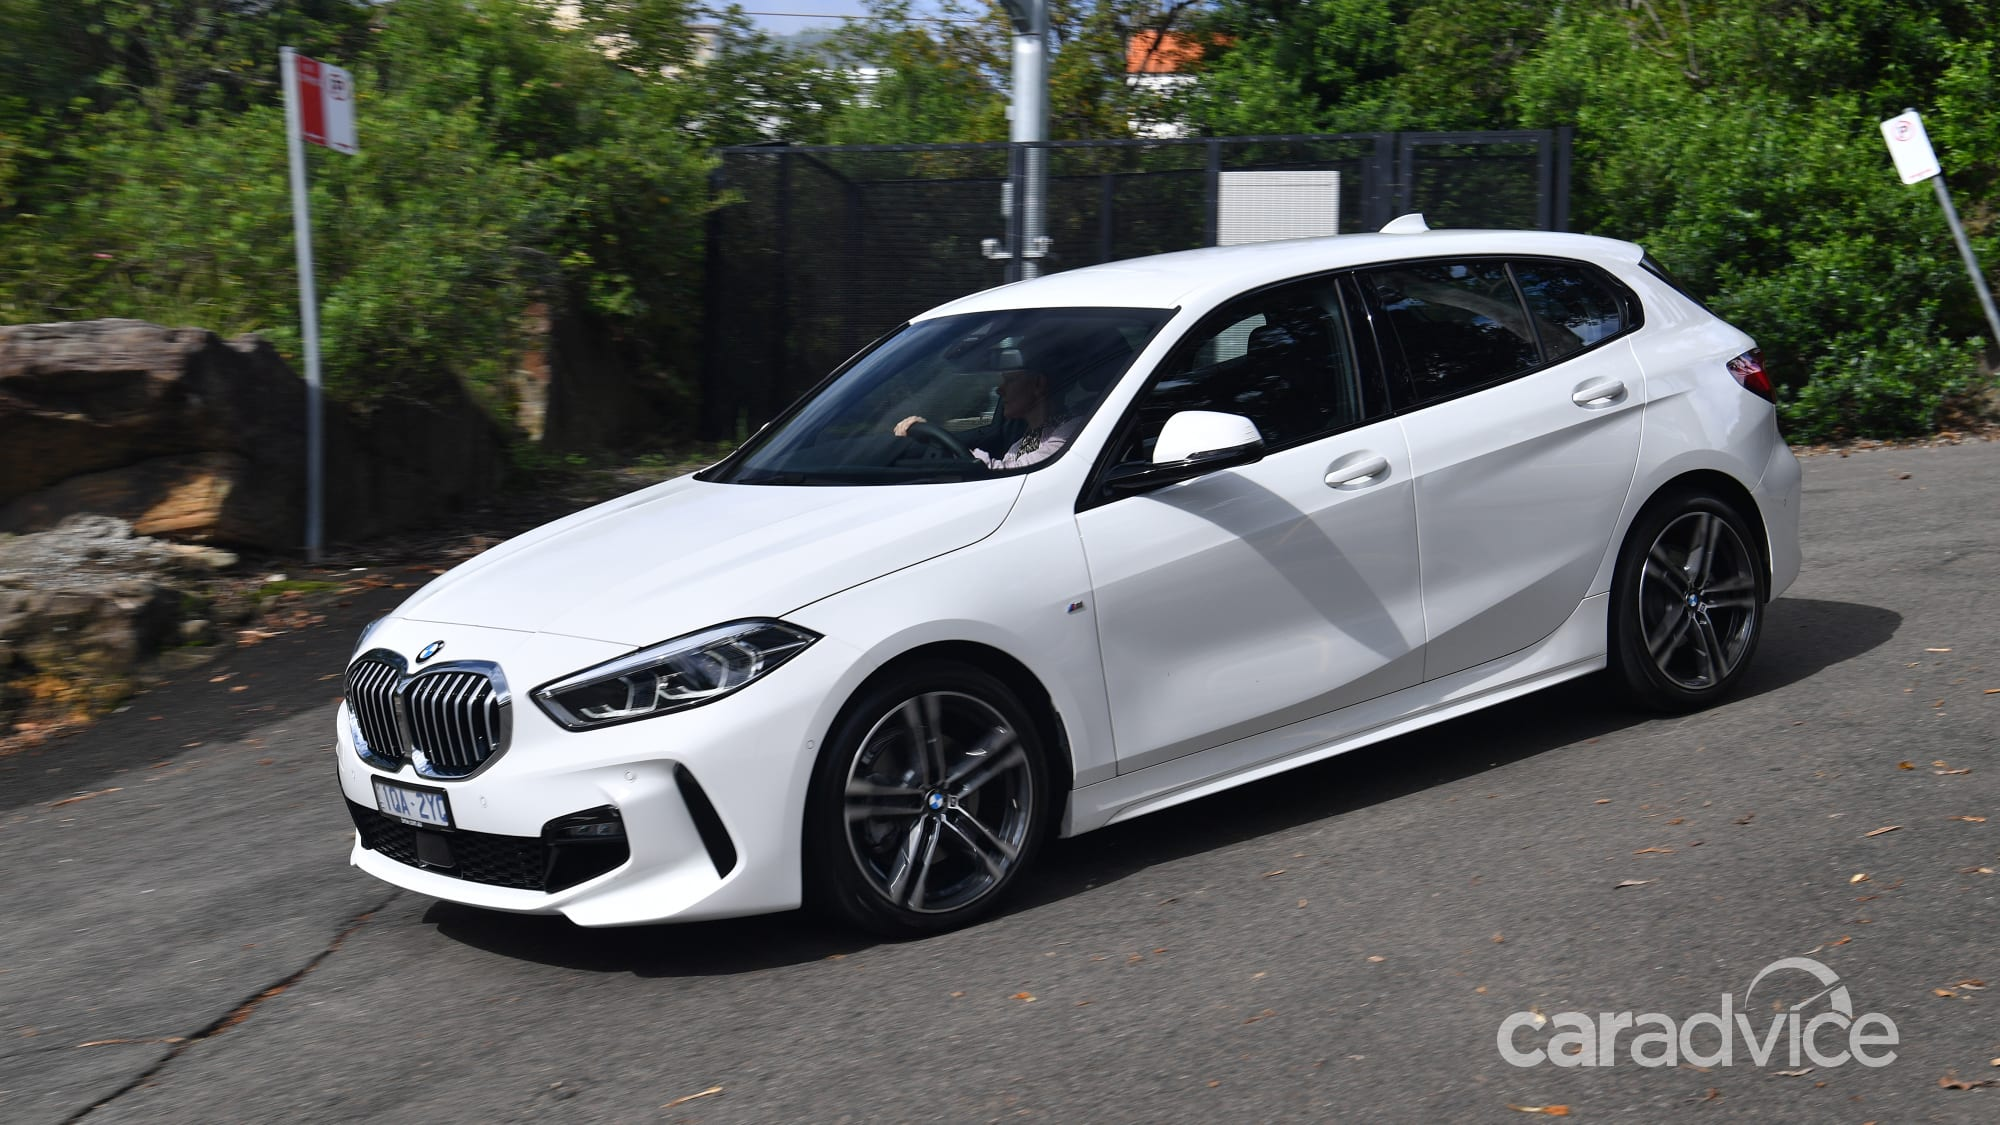 2020 BMW 118i v Mazda 3 G25 Astina comparison   CarAdvice